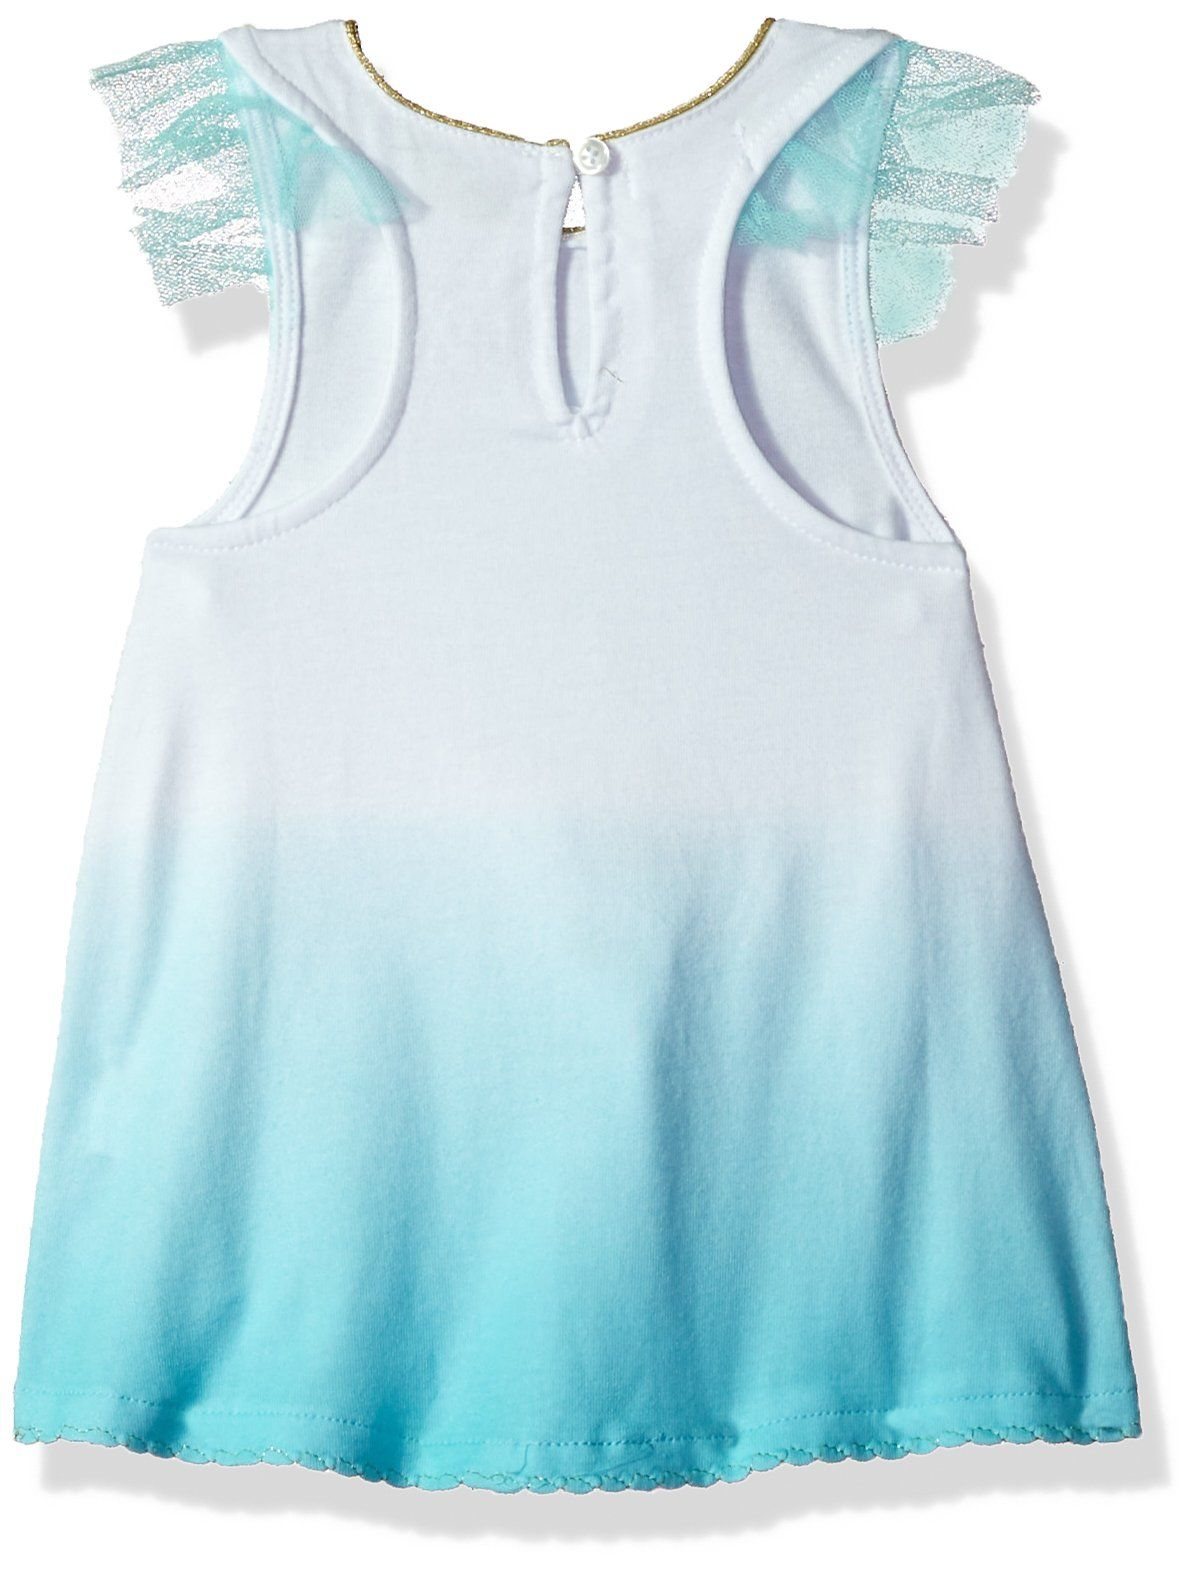 18m Flap Happy Girls Baby UPF 50 Garden Fairies Graphic Rash Suit